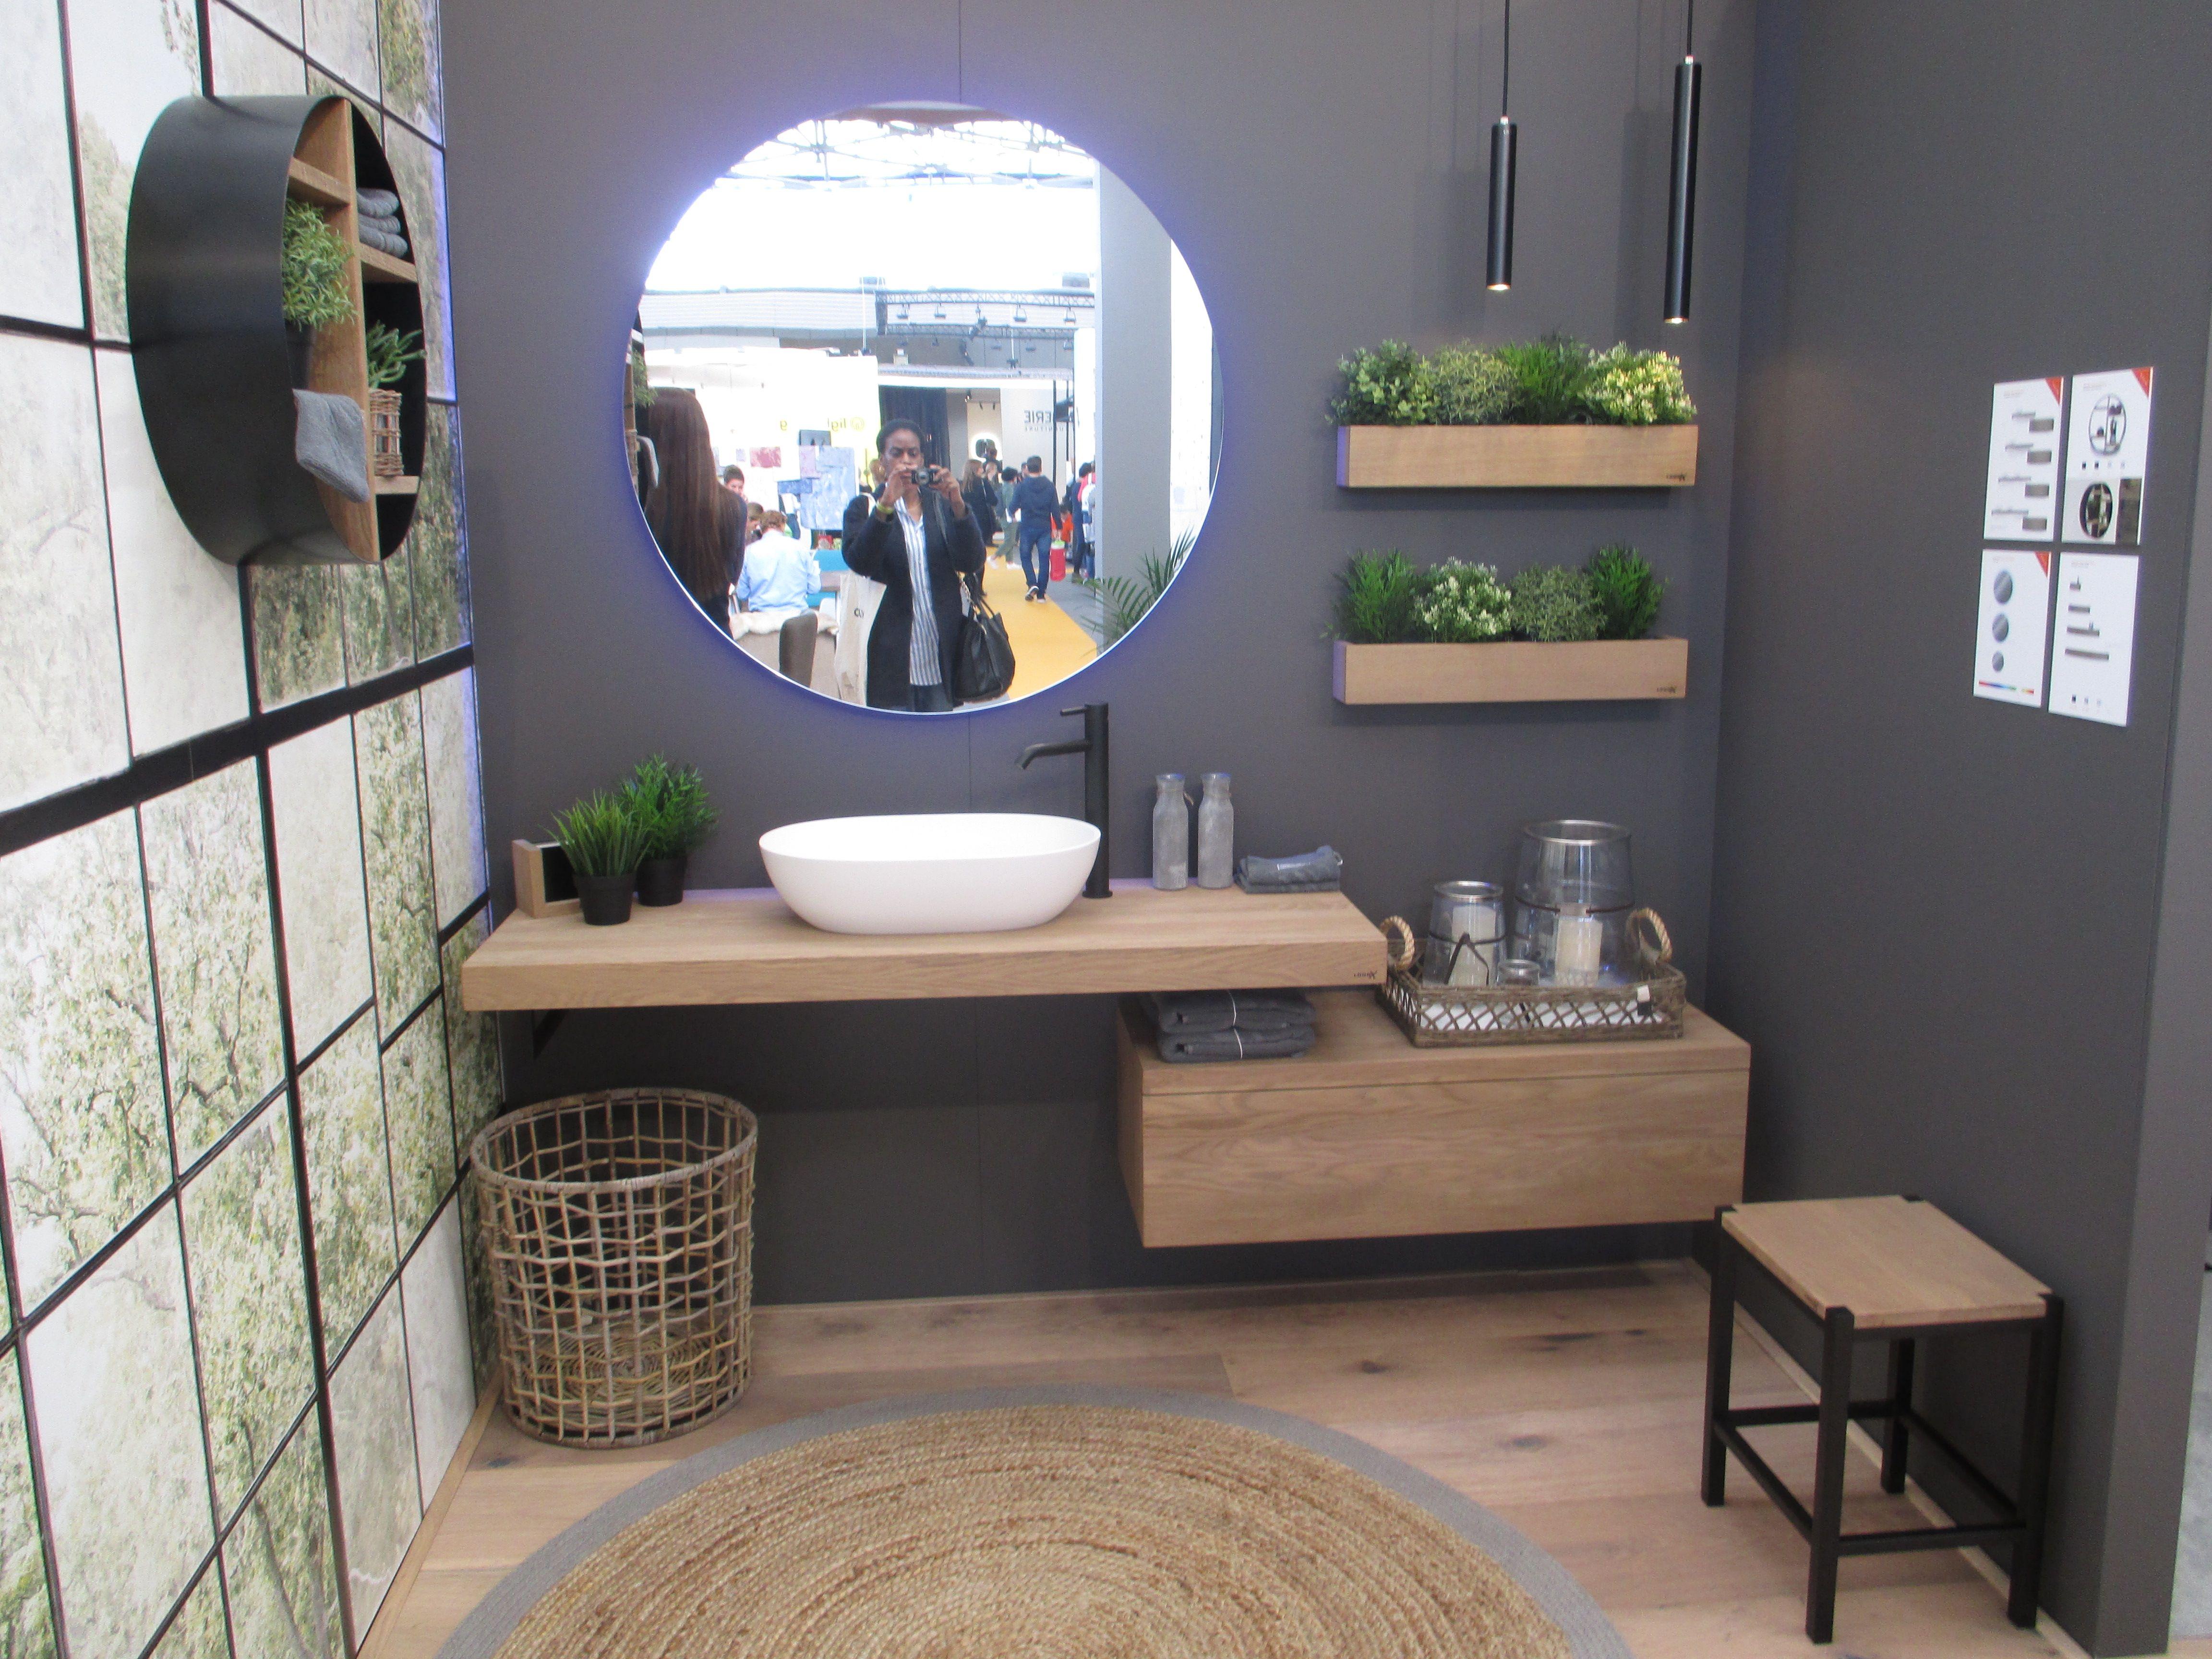 Badkamer Spiegel Kast : Badthroom round mirror grey walls woud plants plant houten kast